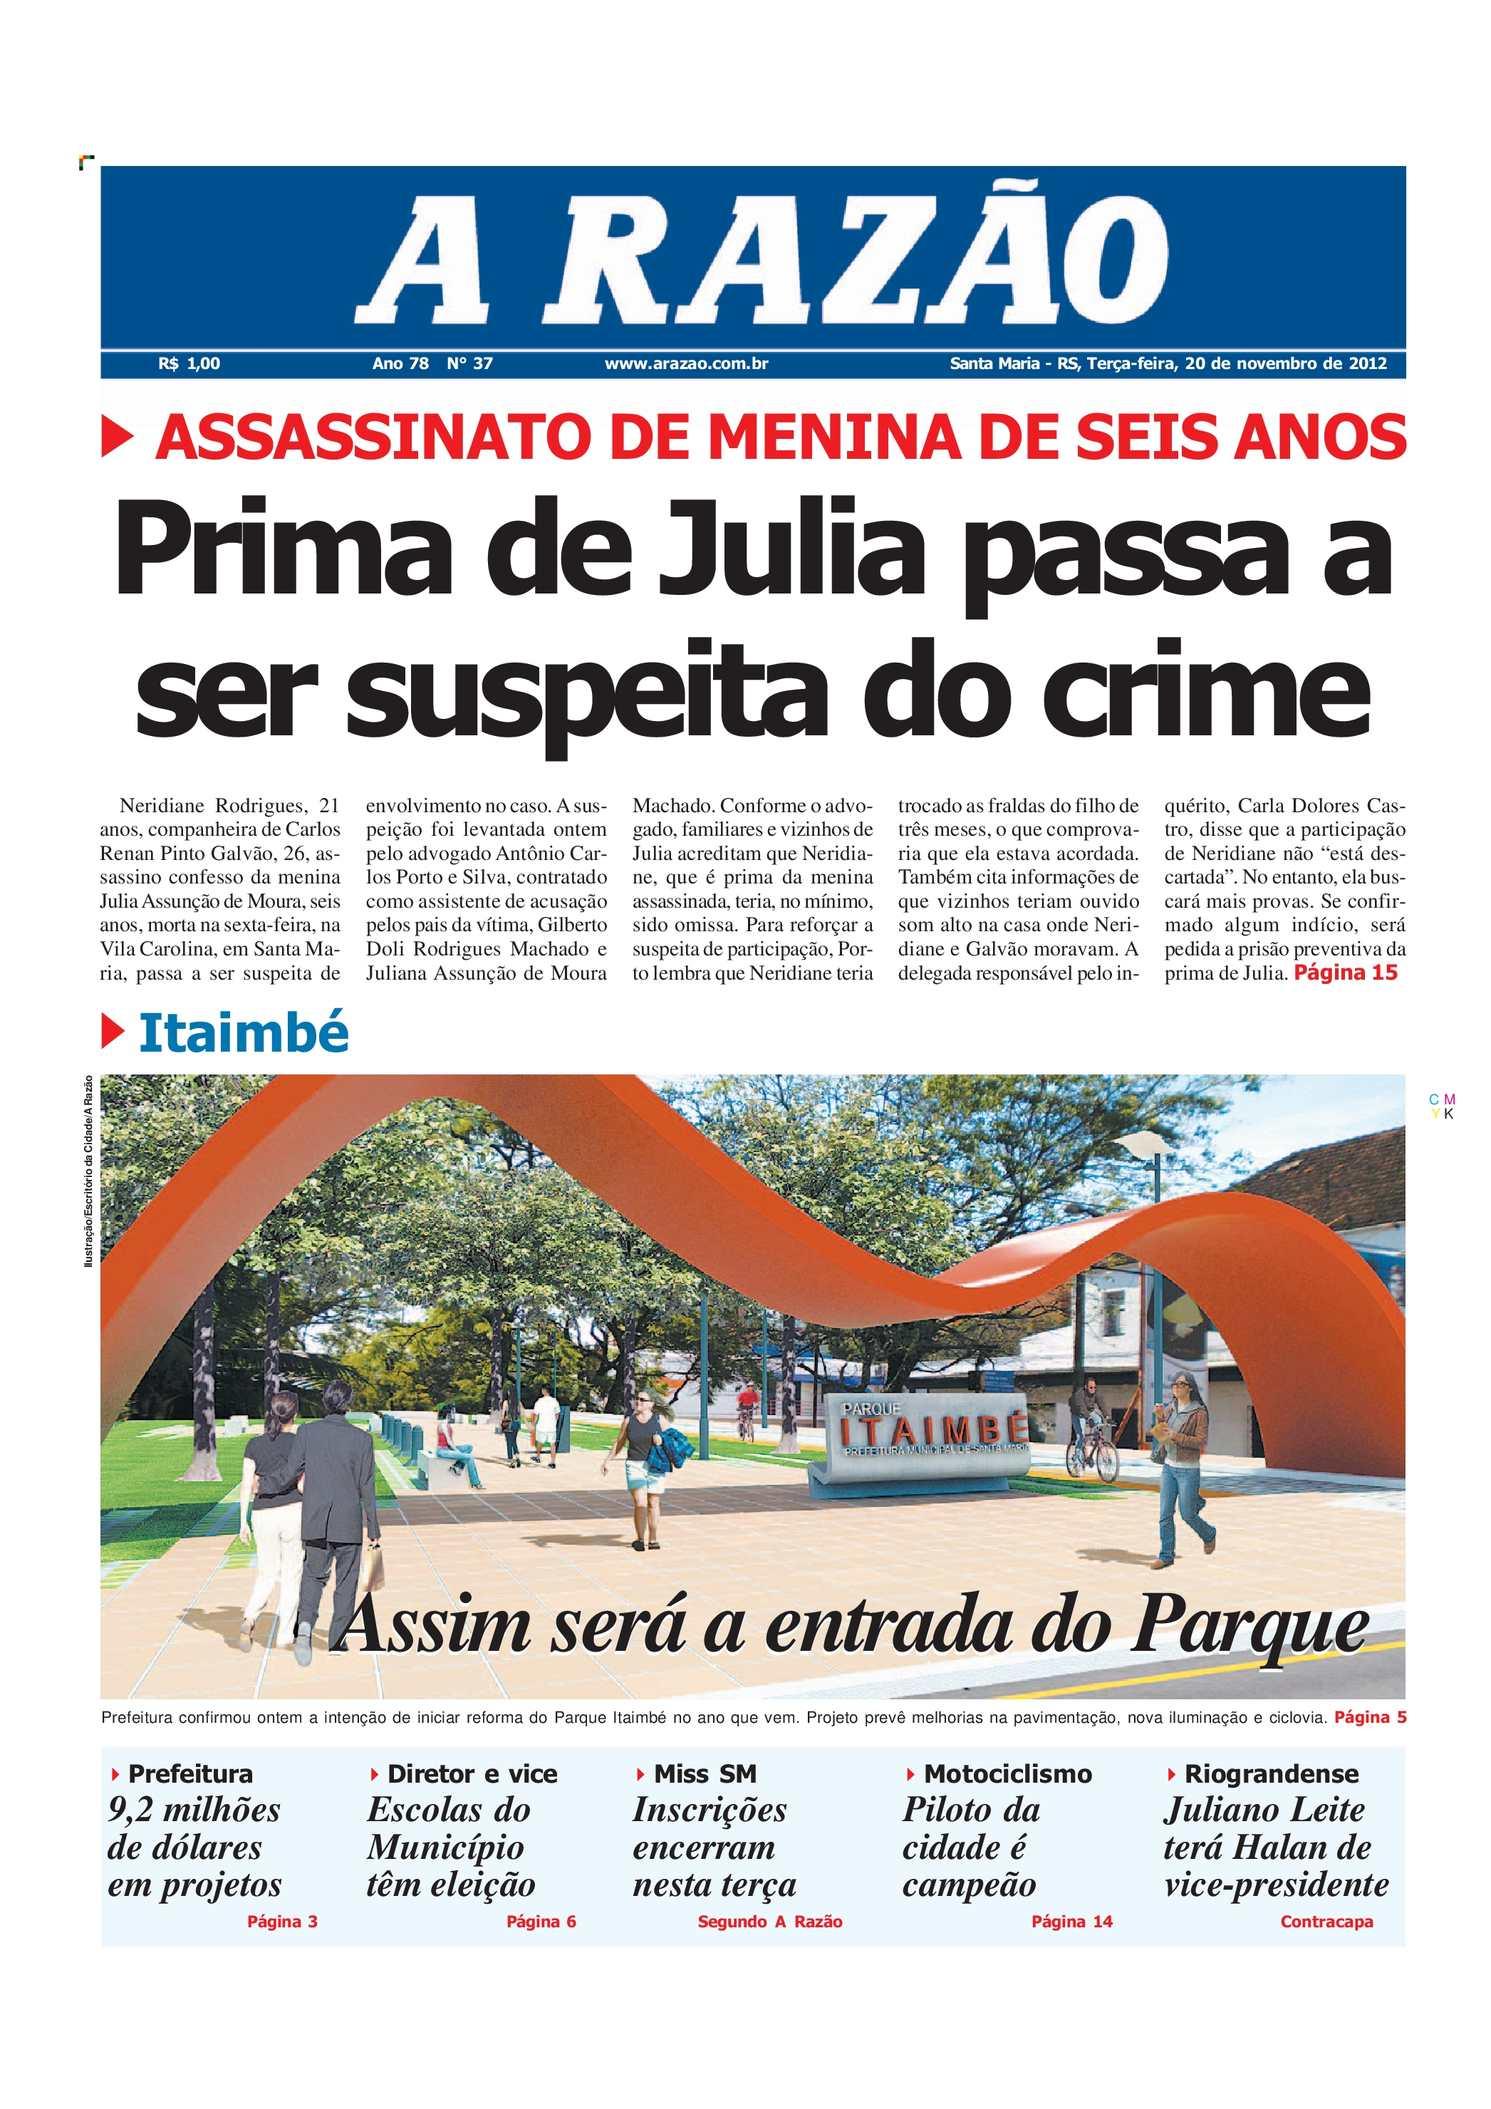 8780c83b3a221 Calaméo - Jornal A Razão Santa Maria - 20112012